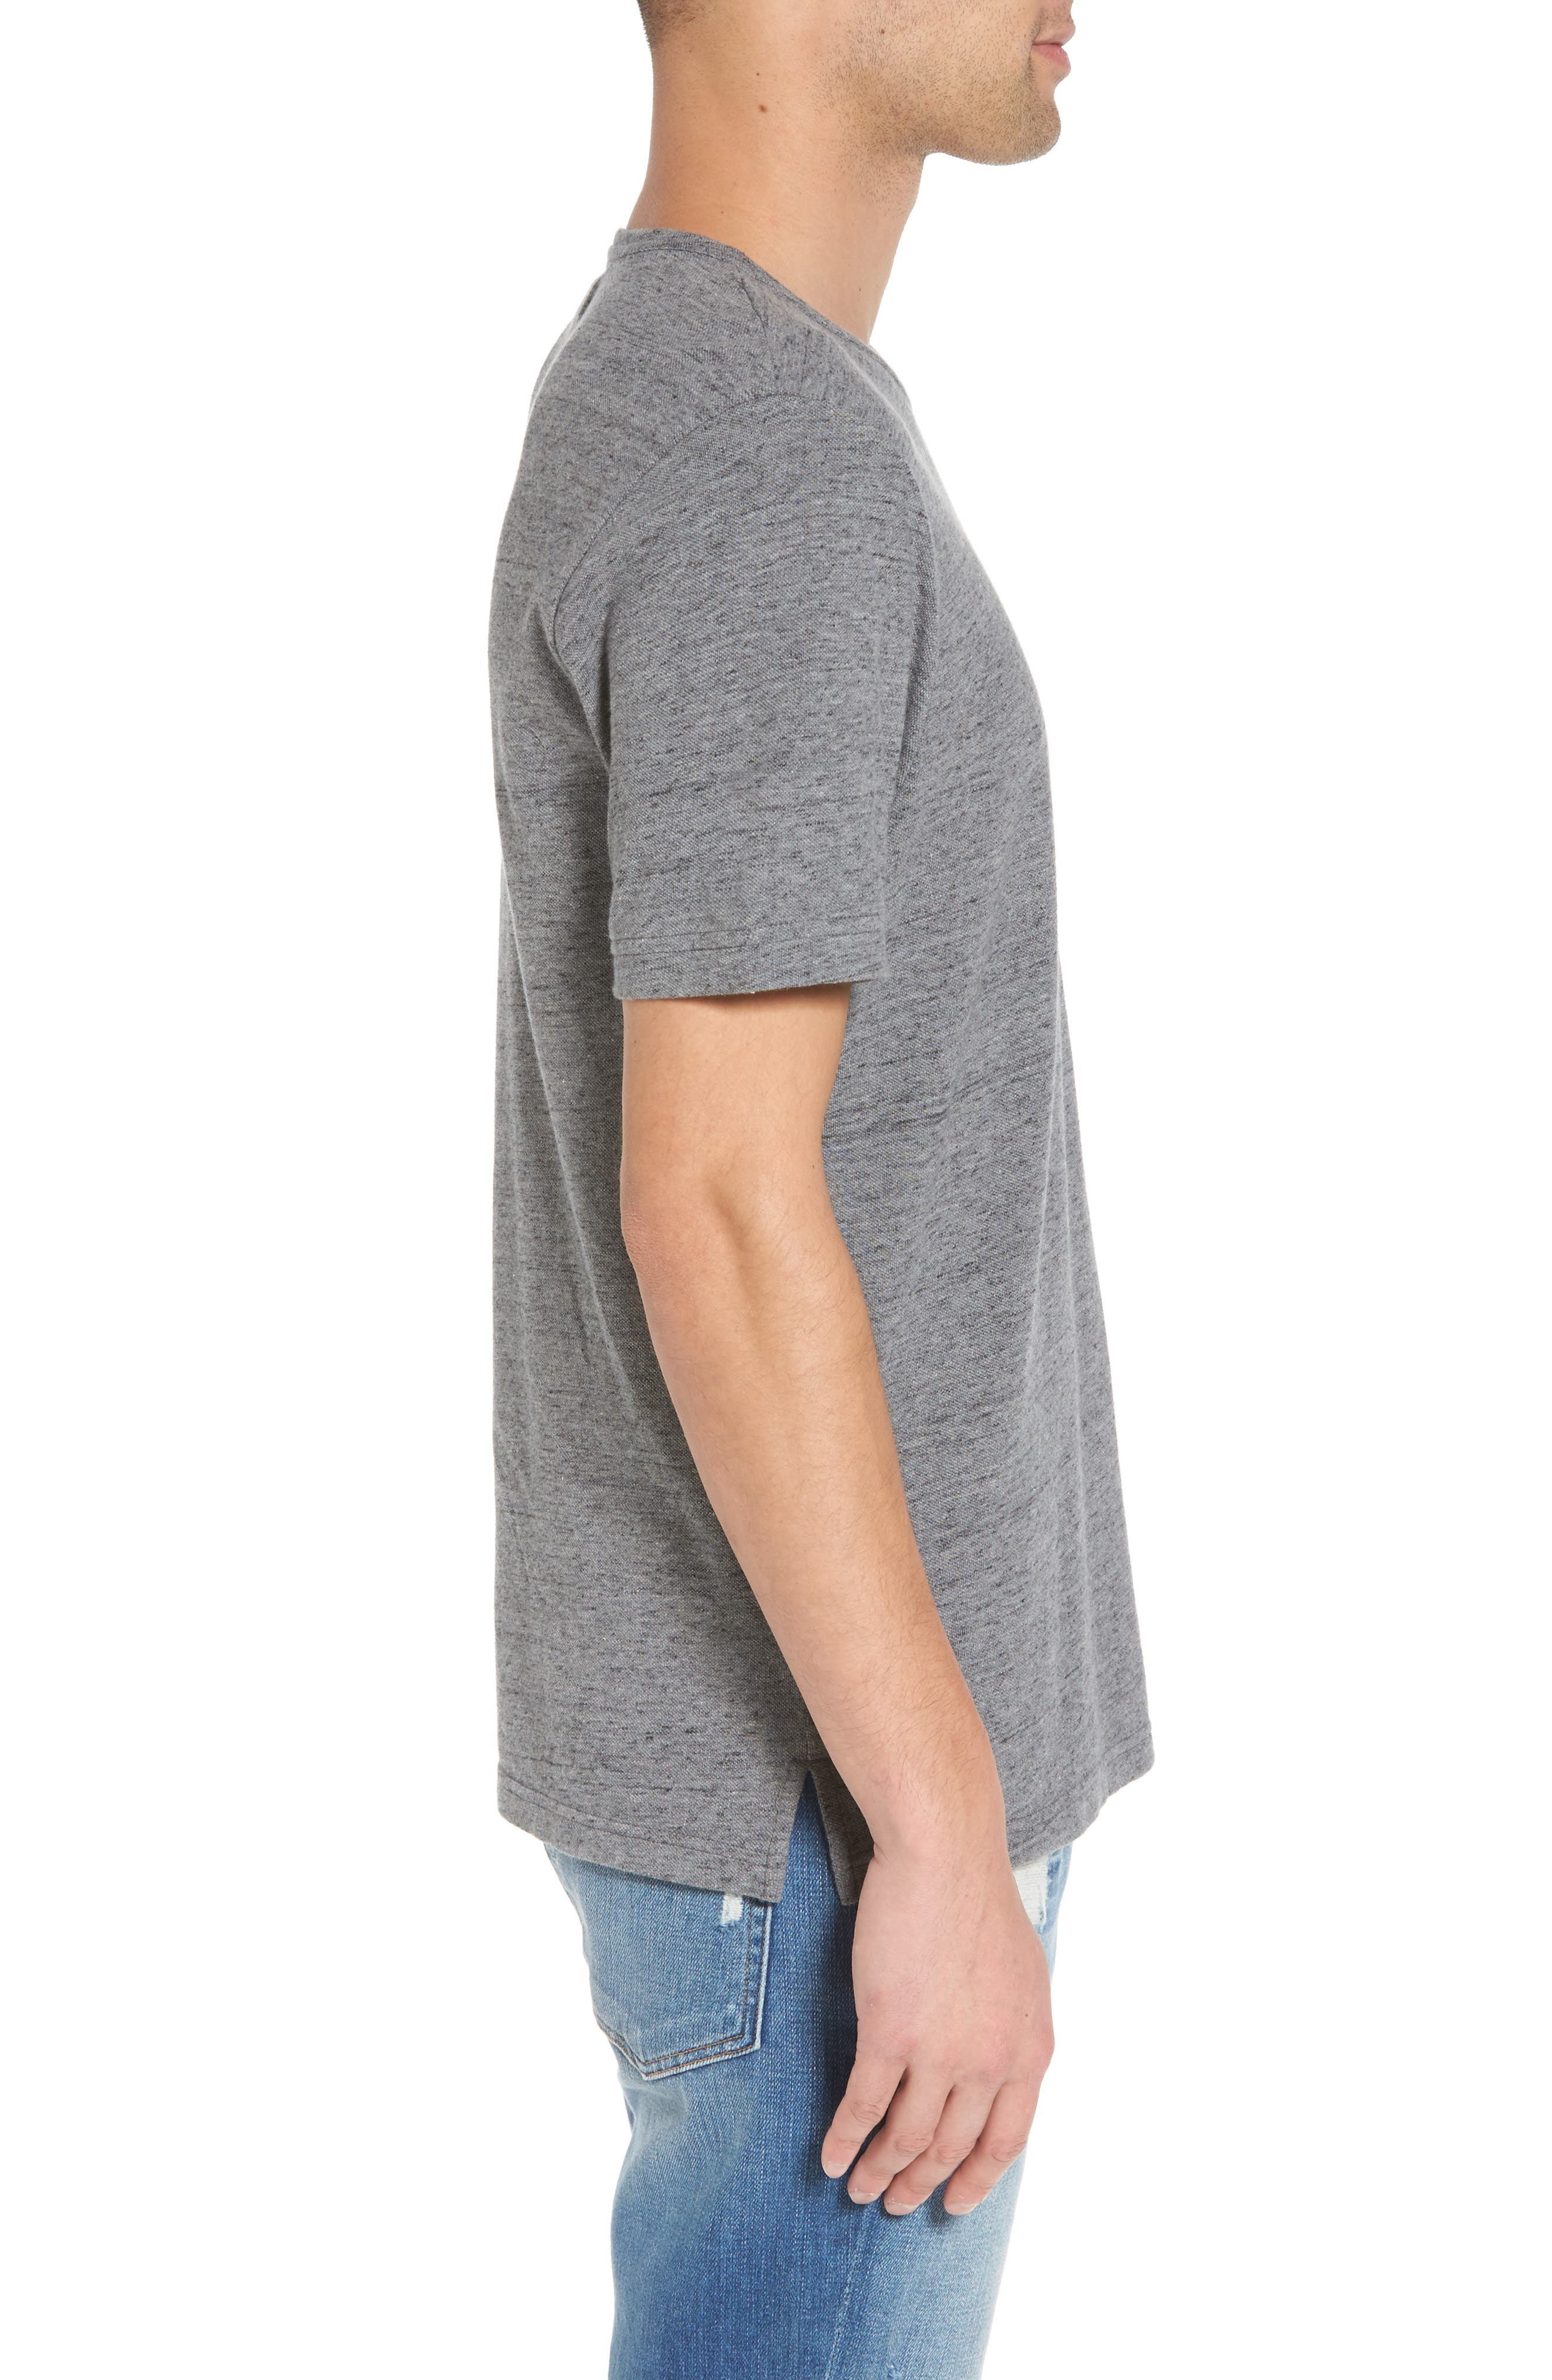 THE RAIL,                             Piqué T-Shirt,                             Alternate thumbnail 3, color,                             030